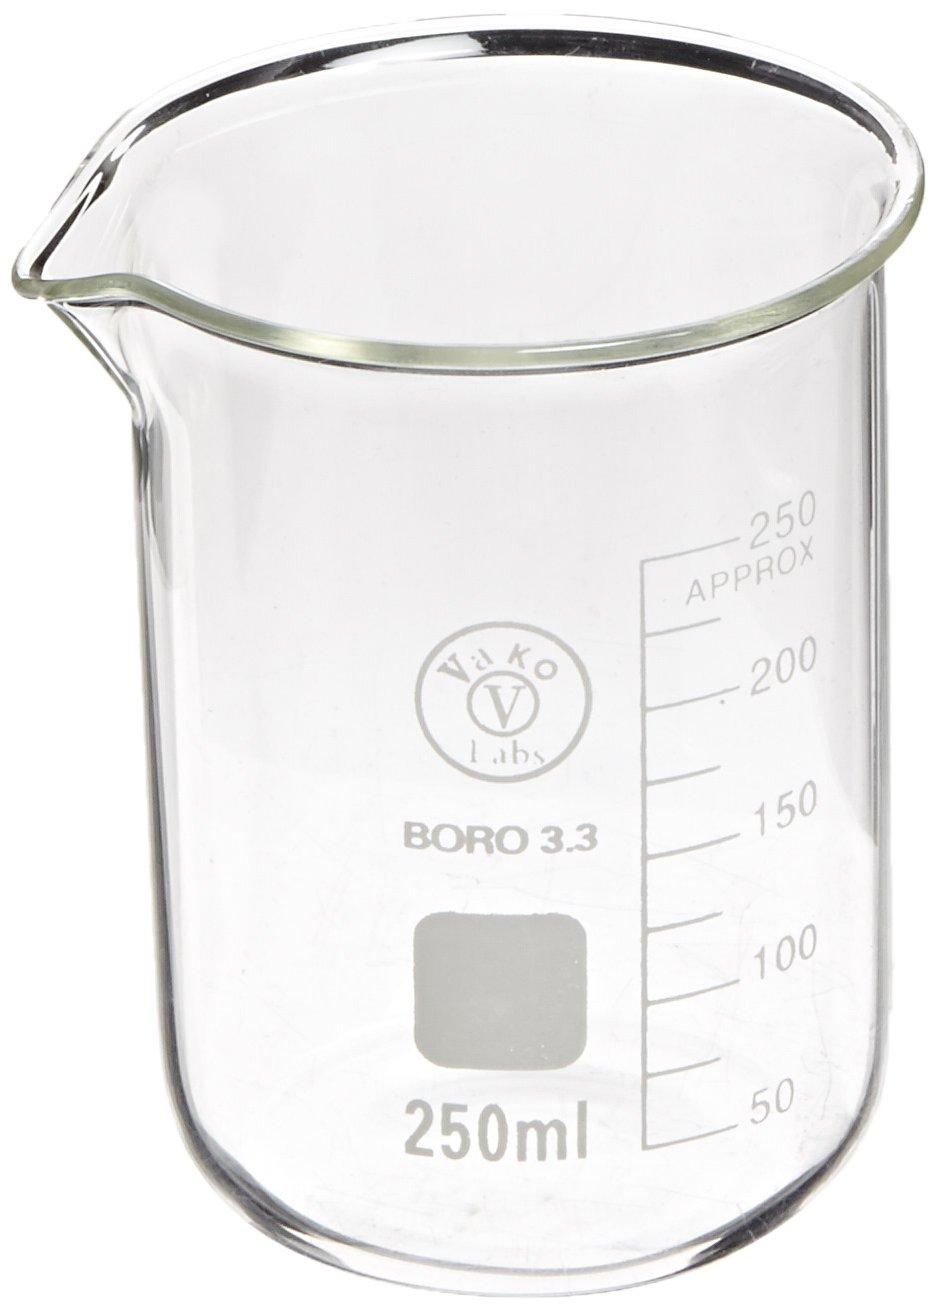 Ajax Scientific Borosilicate Glass Graduated Beaker, 250mL GL010-0250